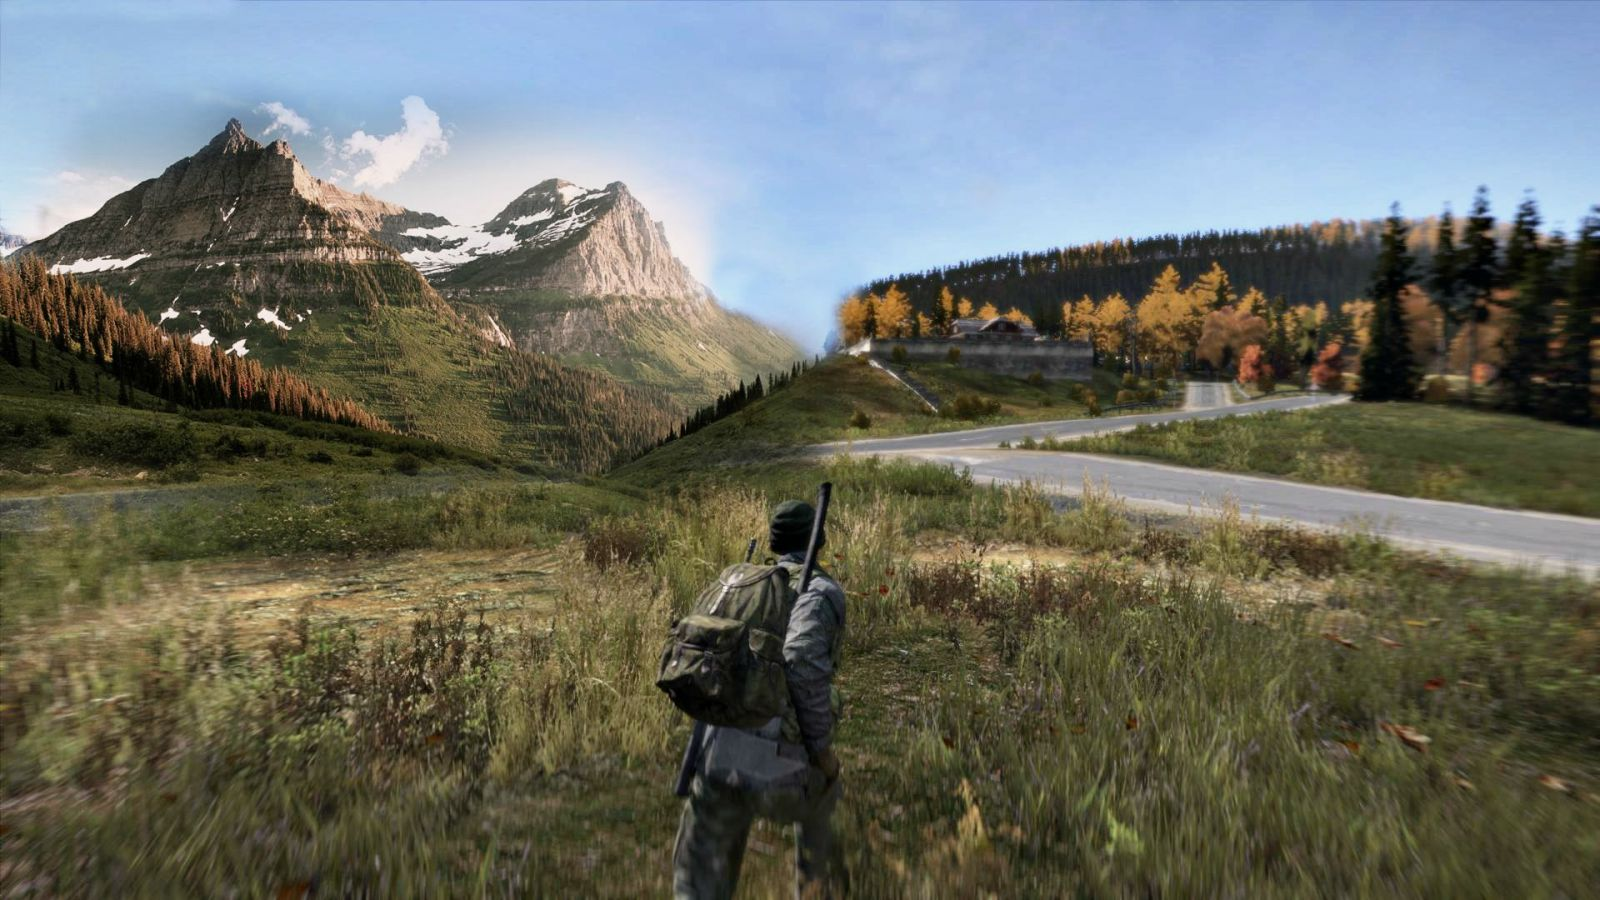 Imagine if Dayz has scenery like this..